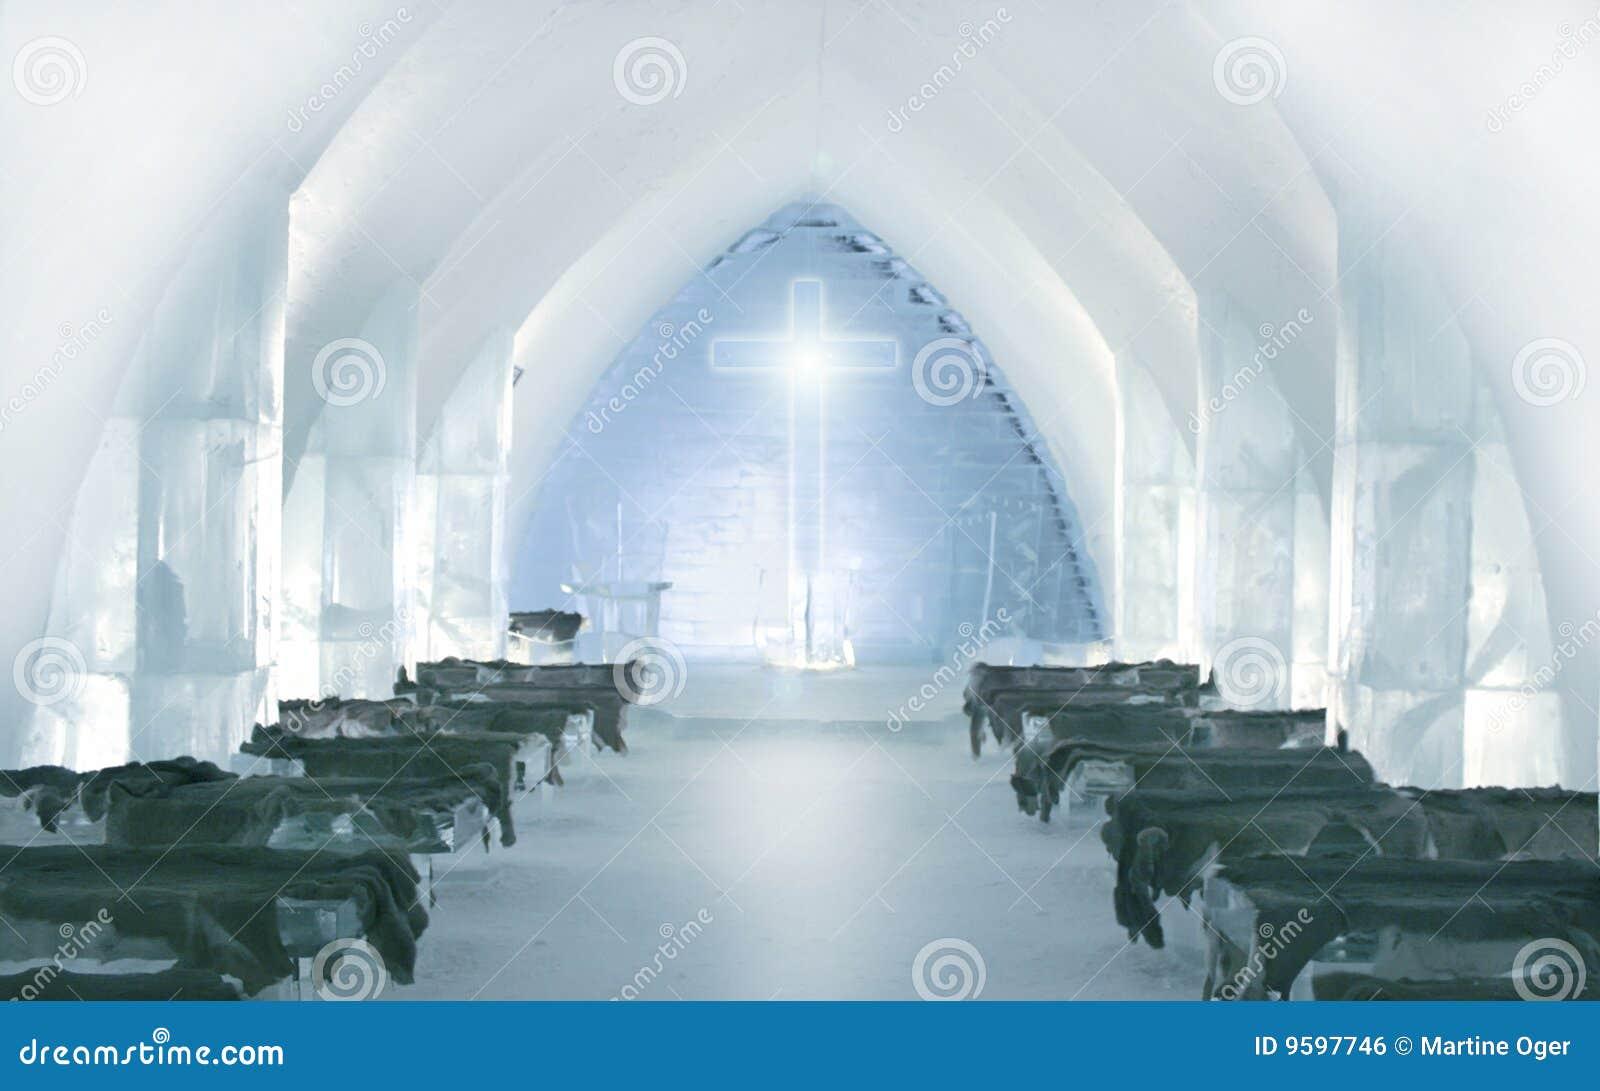 igloo in ice stock photography image 16609552